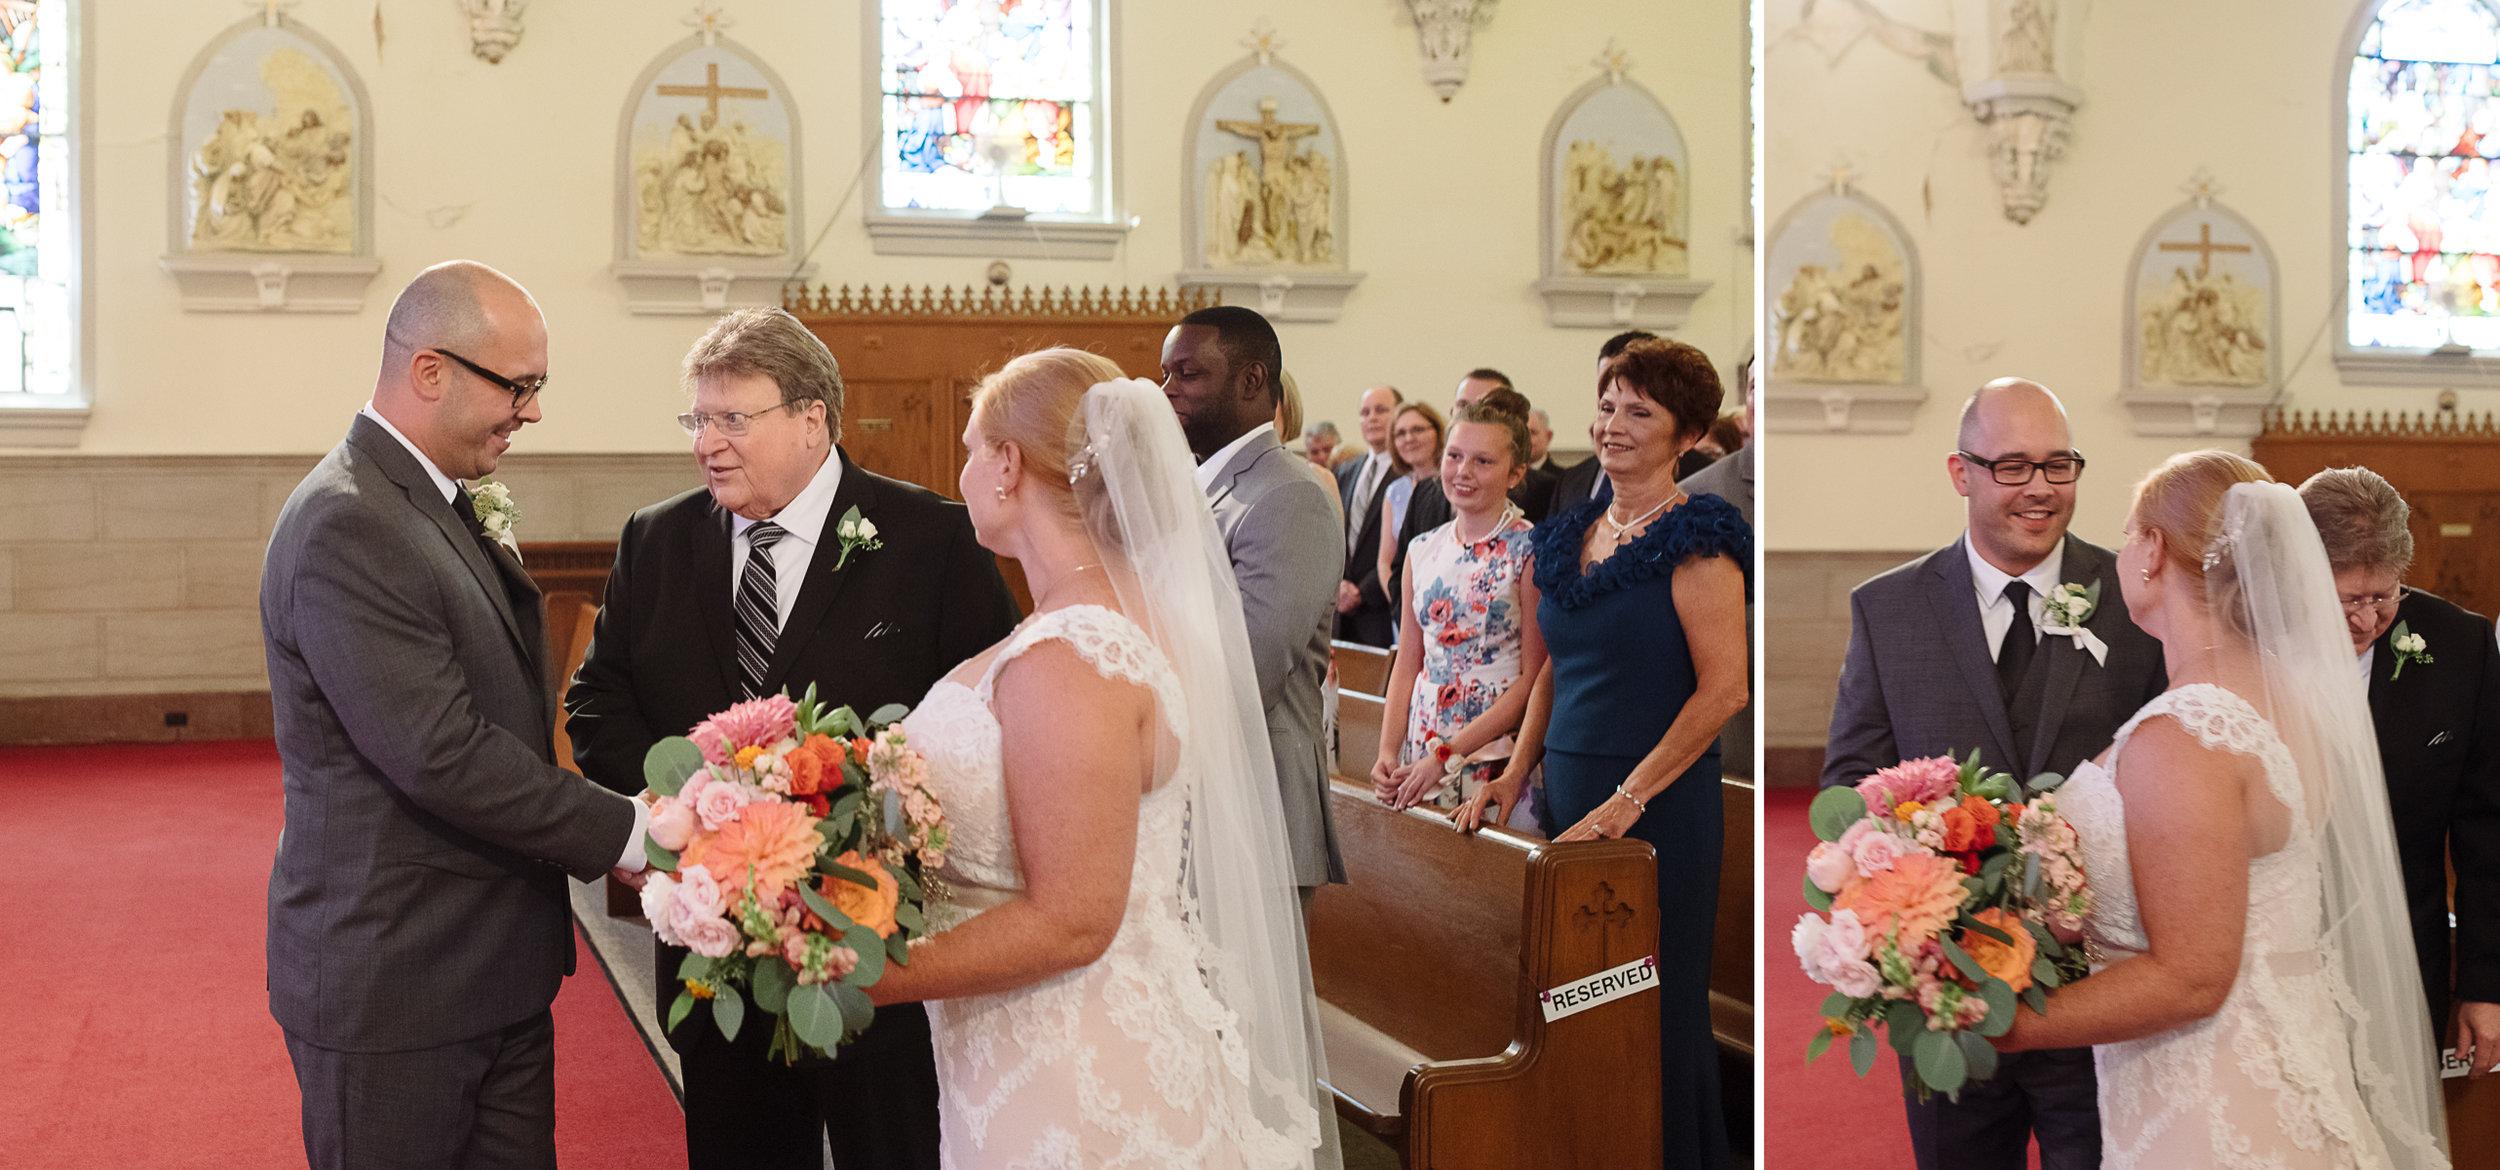 wedding ceremony, mariah fisher photography.jpg